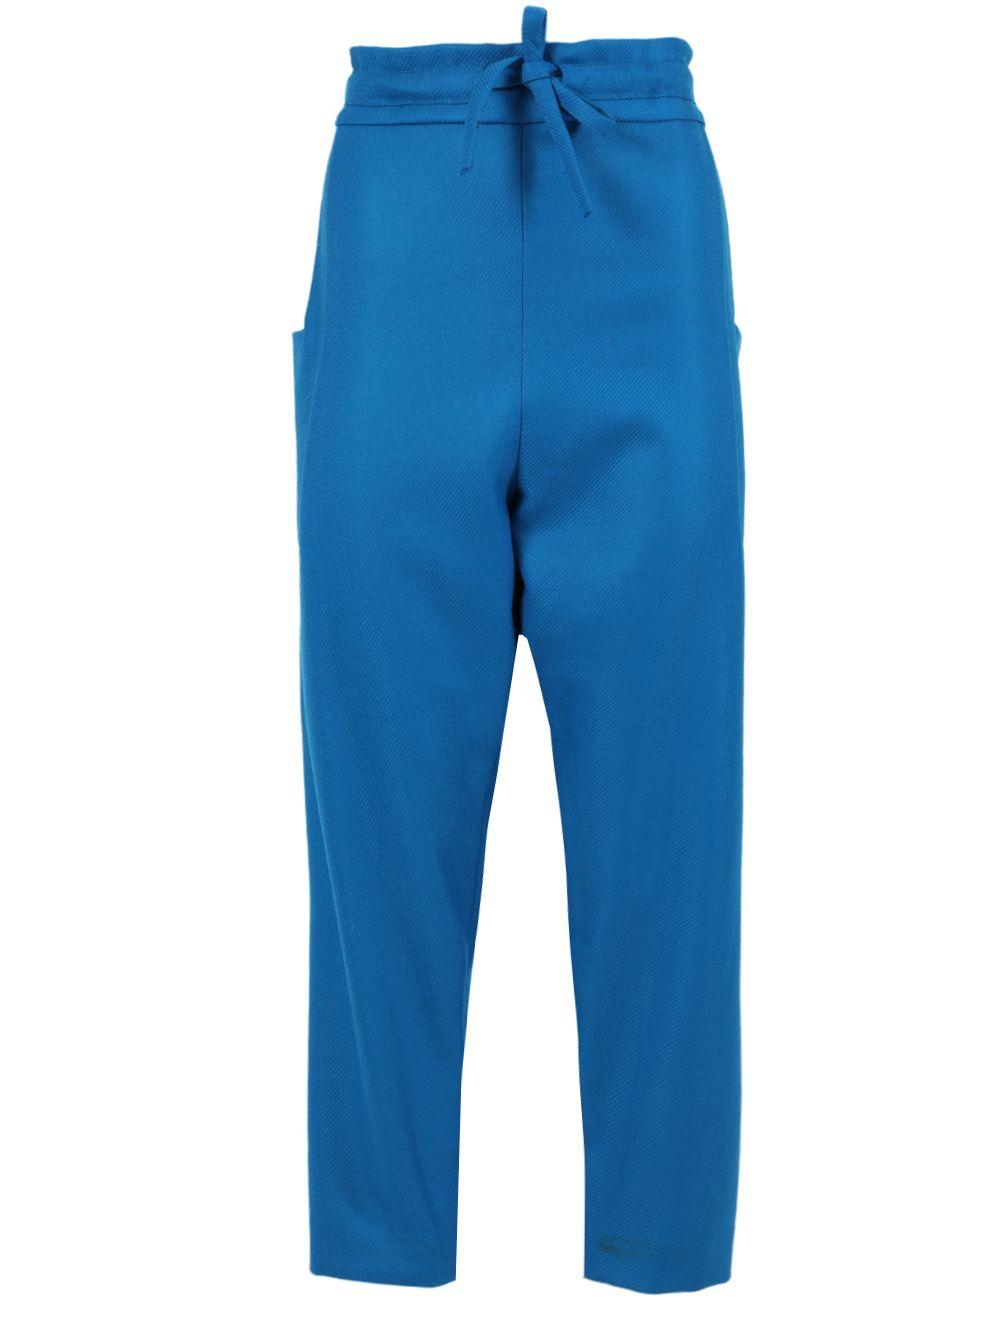 Maison Rabih Kayrouz BLUE TWILL WOVEN PANTS